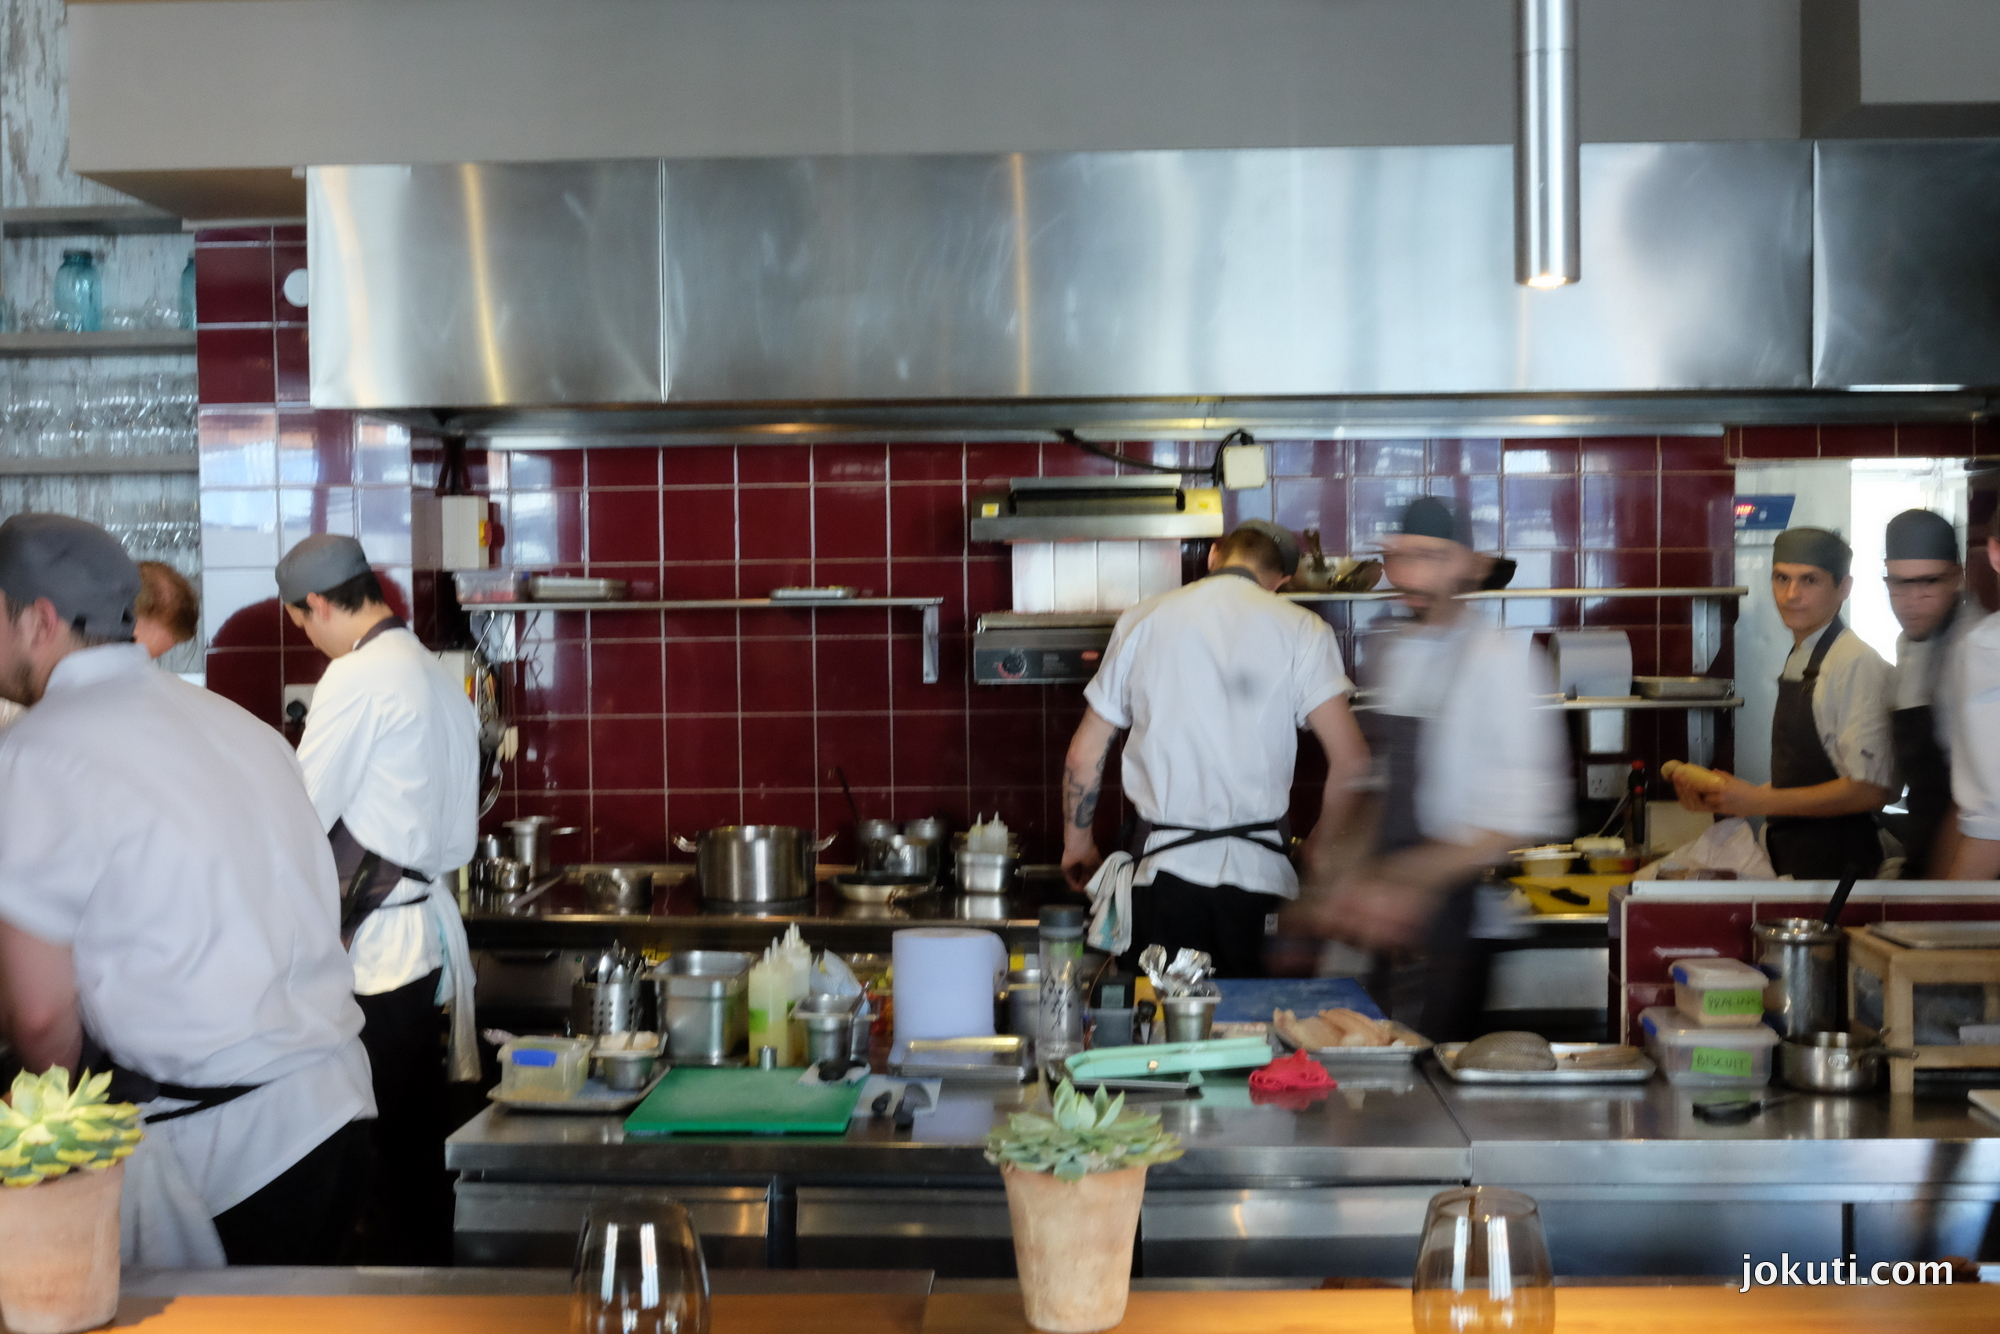 dscf5342_hedone_london_chiswick_mikael_jonsson_restaurant_vilagevo_jokuti.jpg